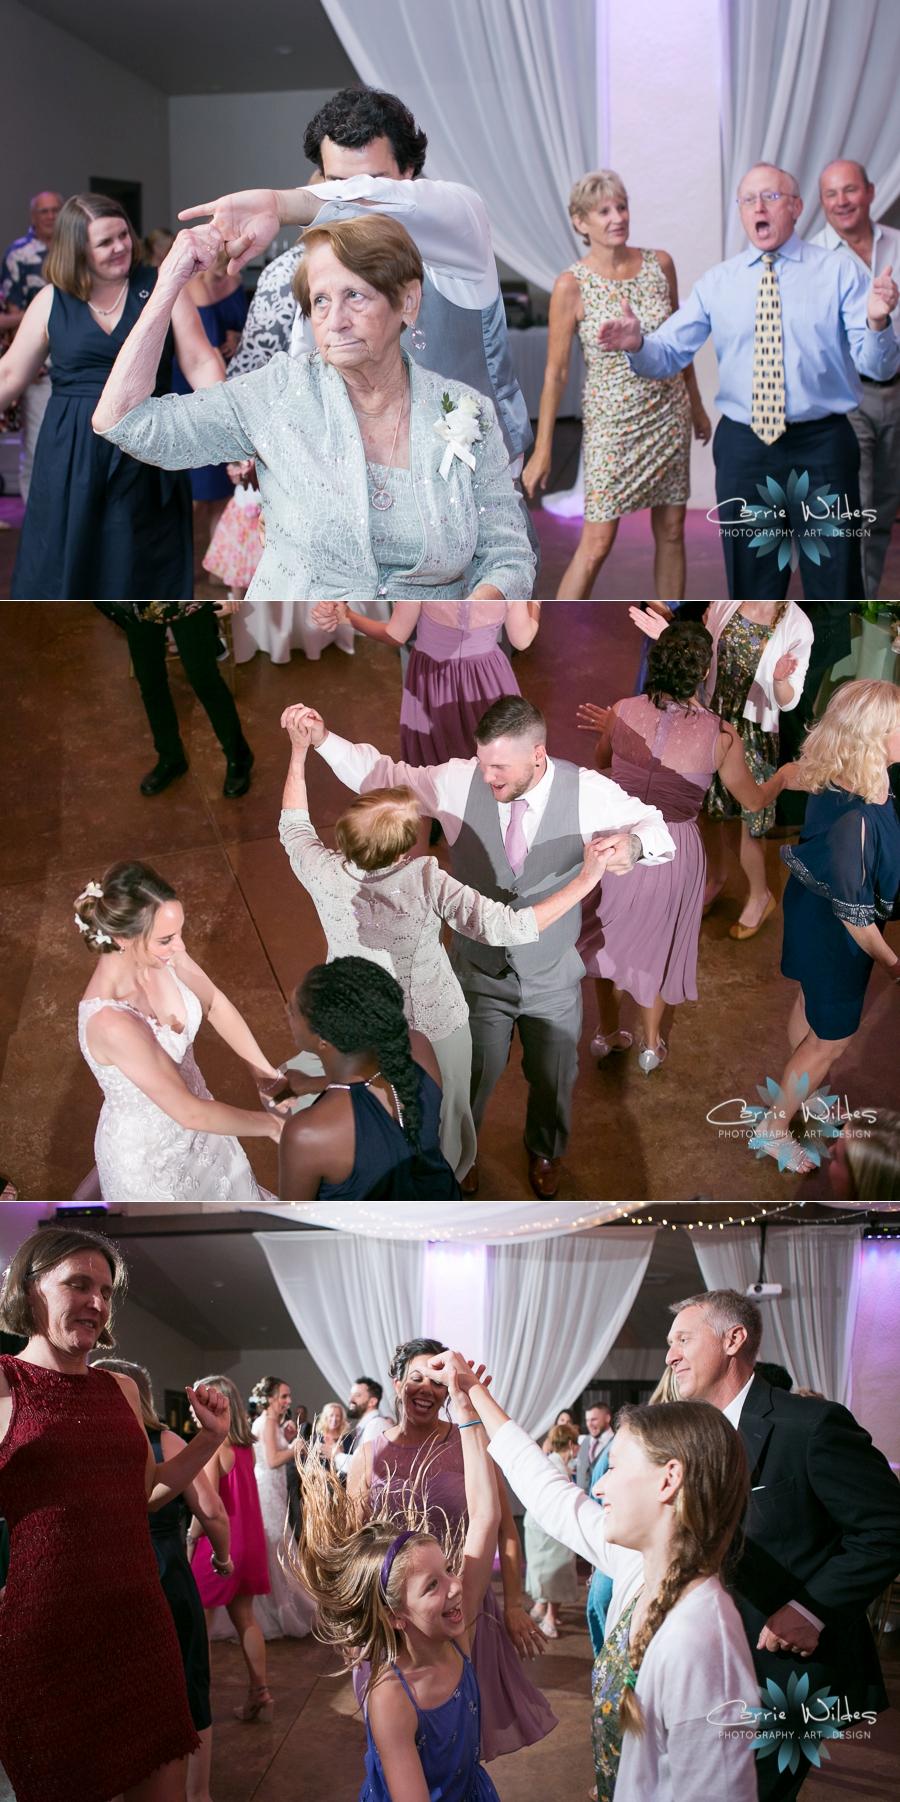 3_16_19 Bakers Ranch Wedding Marisa and Ricky Wedding_0052.jpg